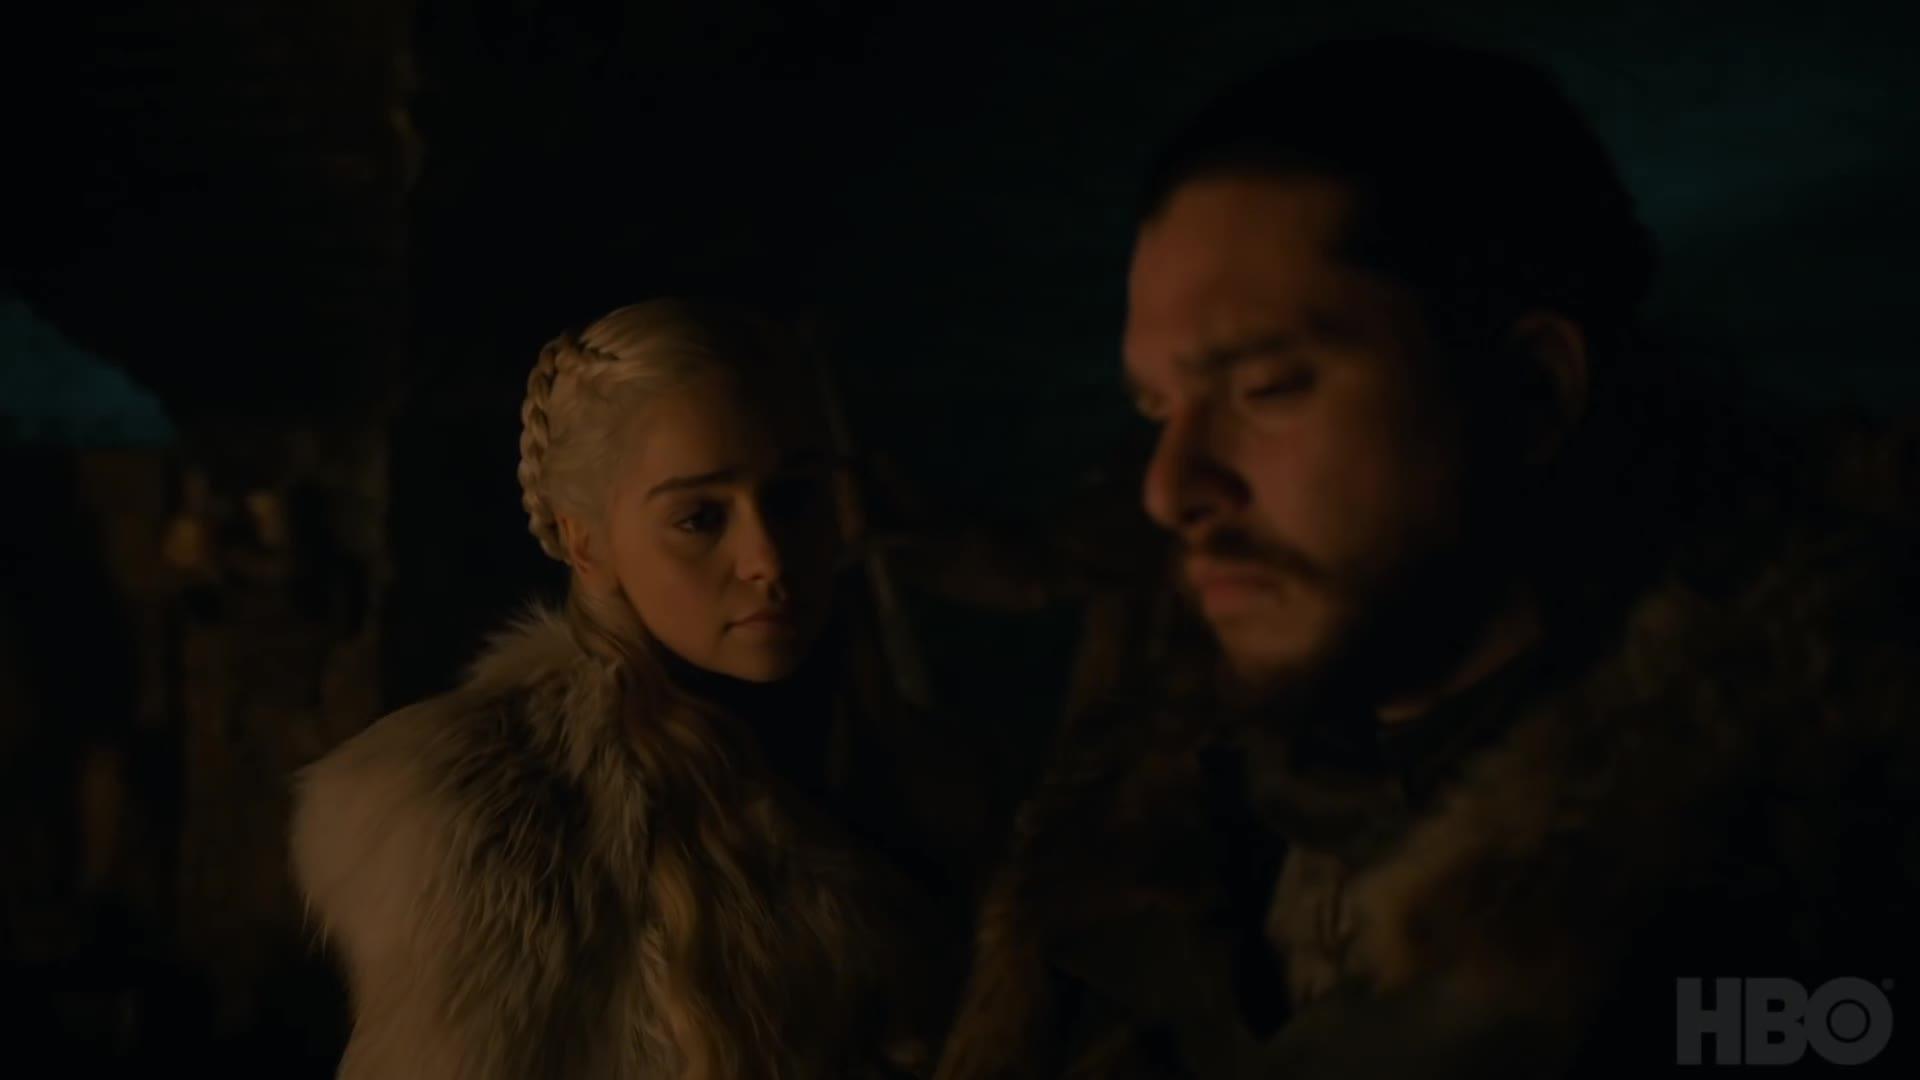 daenerys targaryen, game of thrones, gameofthrones, hbo, jon snow, kit harington, season 8, television, Jon and Daenerys Game of Thrones GIFs